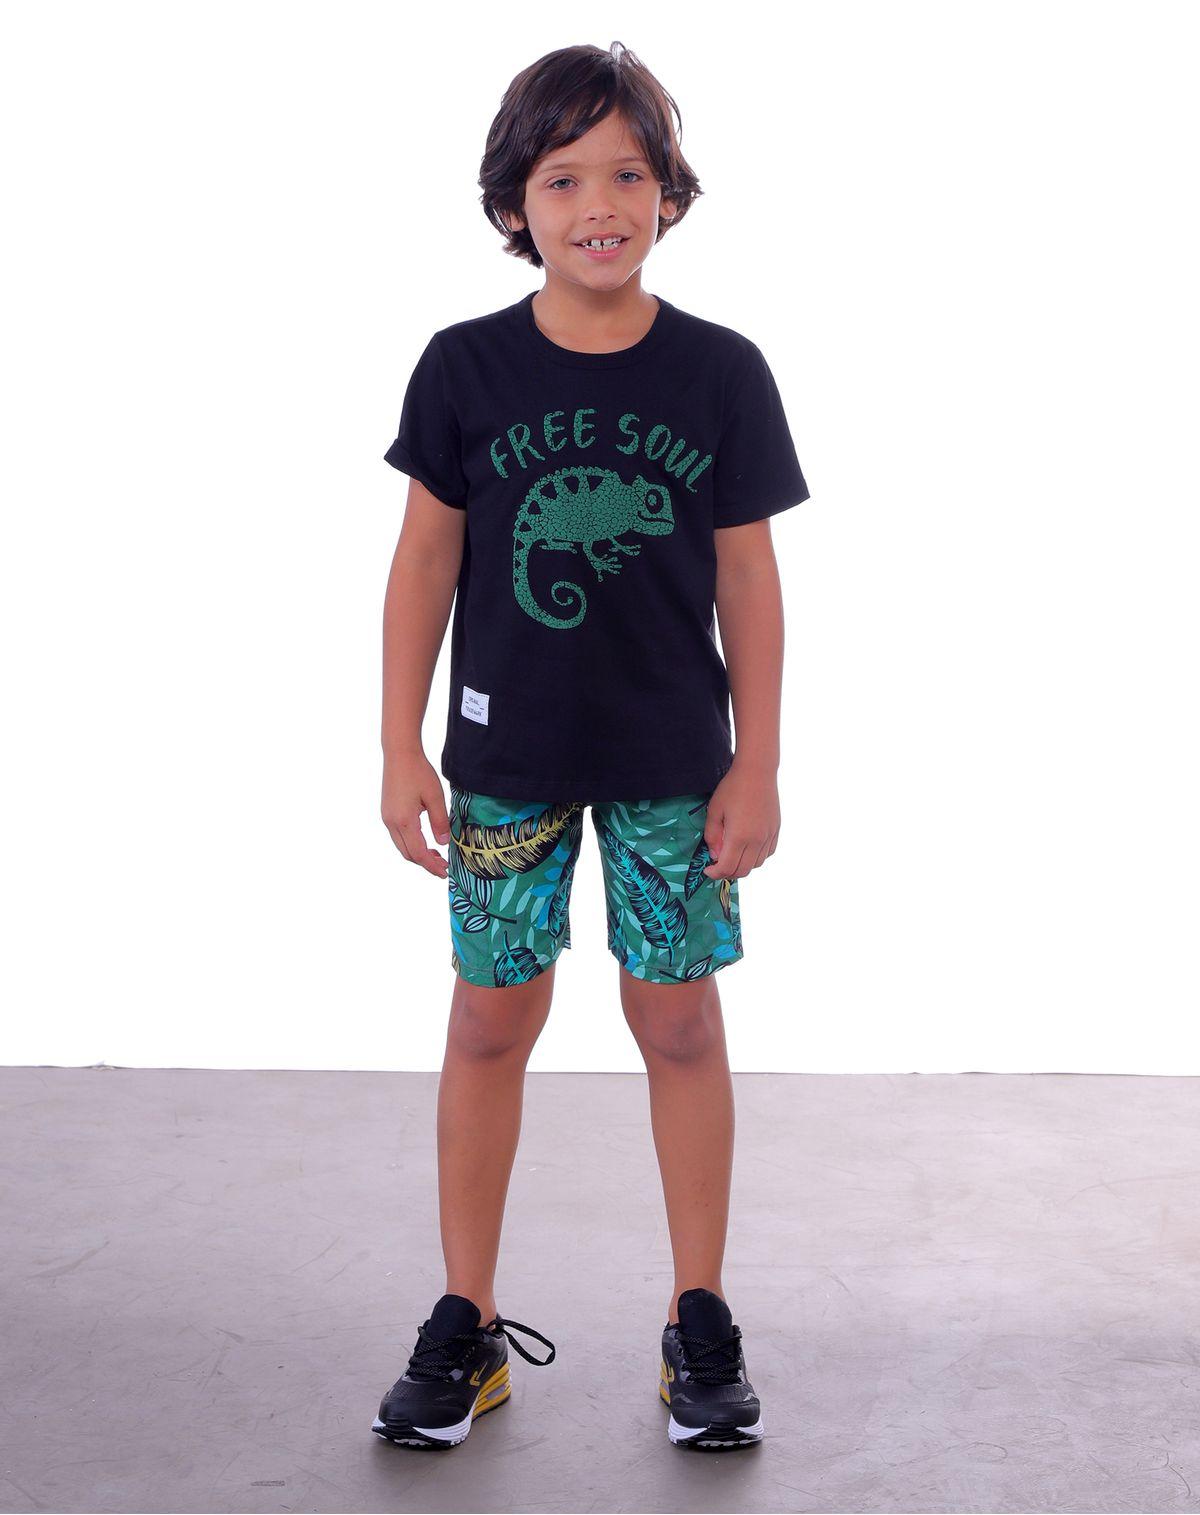 565966011-conjunto-curto-infantil-menino-estampa-camaleao-preto-8-d51